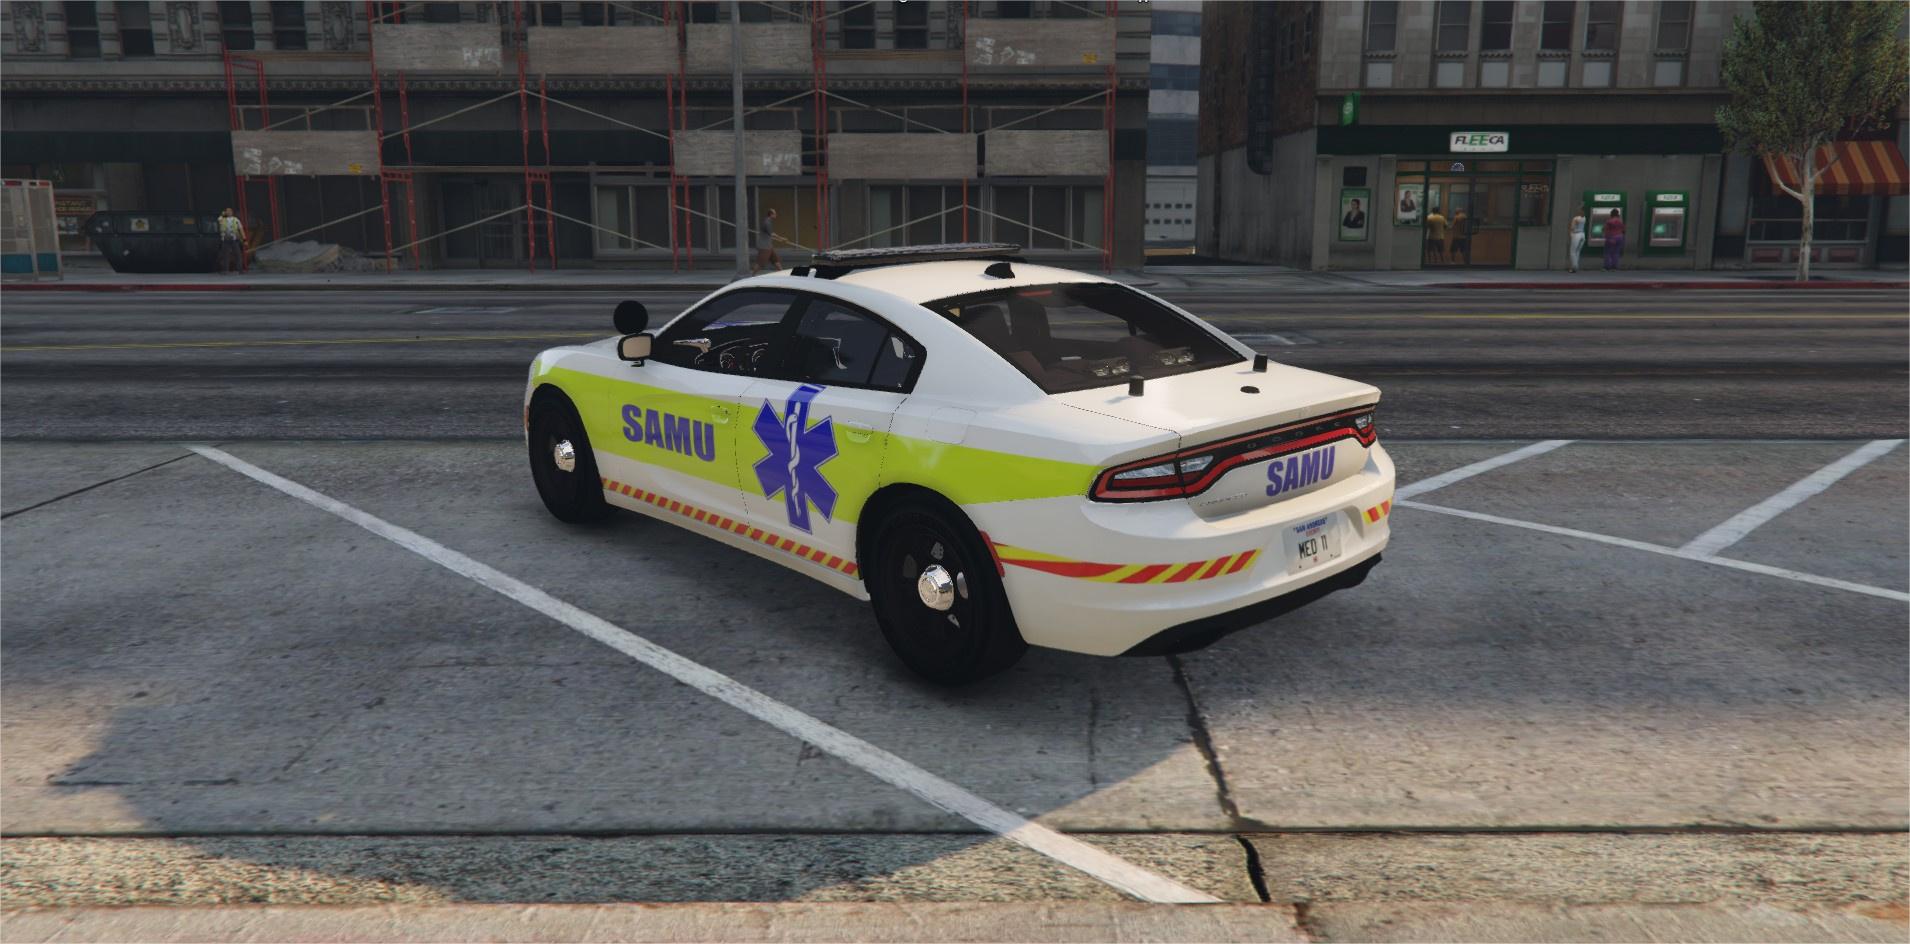 Dodge Charger RT SAMU | For FiveM And SP - GTA5-Mods com